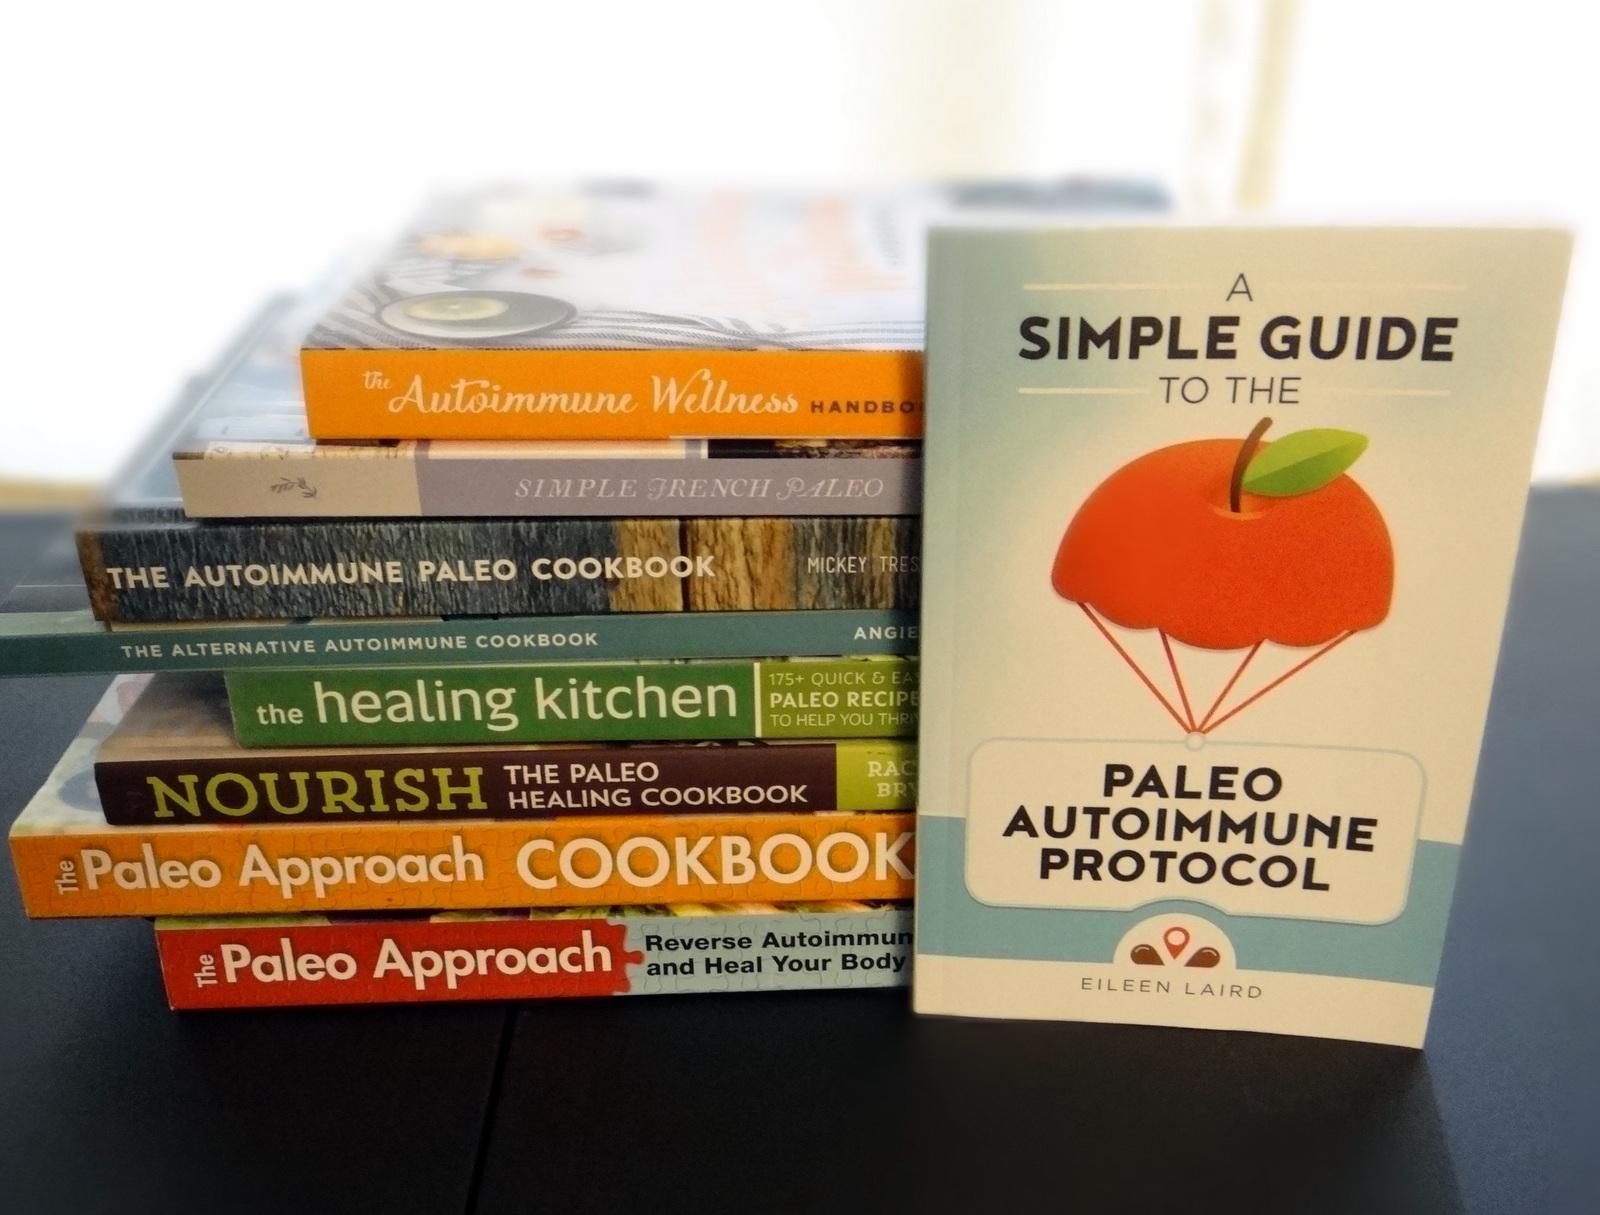 Healing Store - Paleo AIP Books, Classes, Cookbooks & Meal Plans | Phoenix Helix